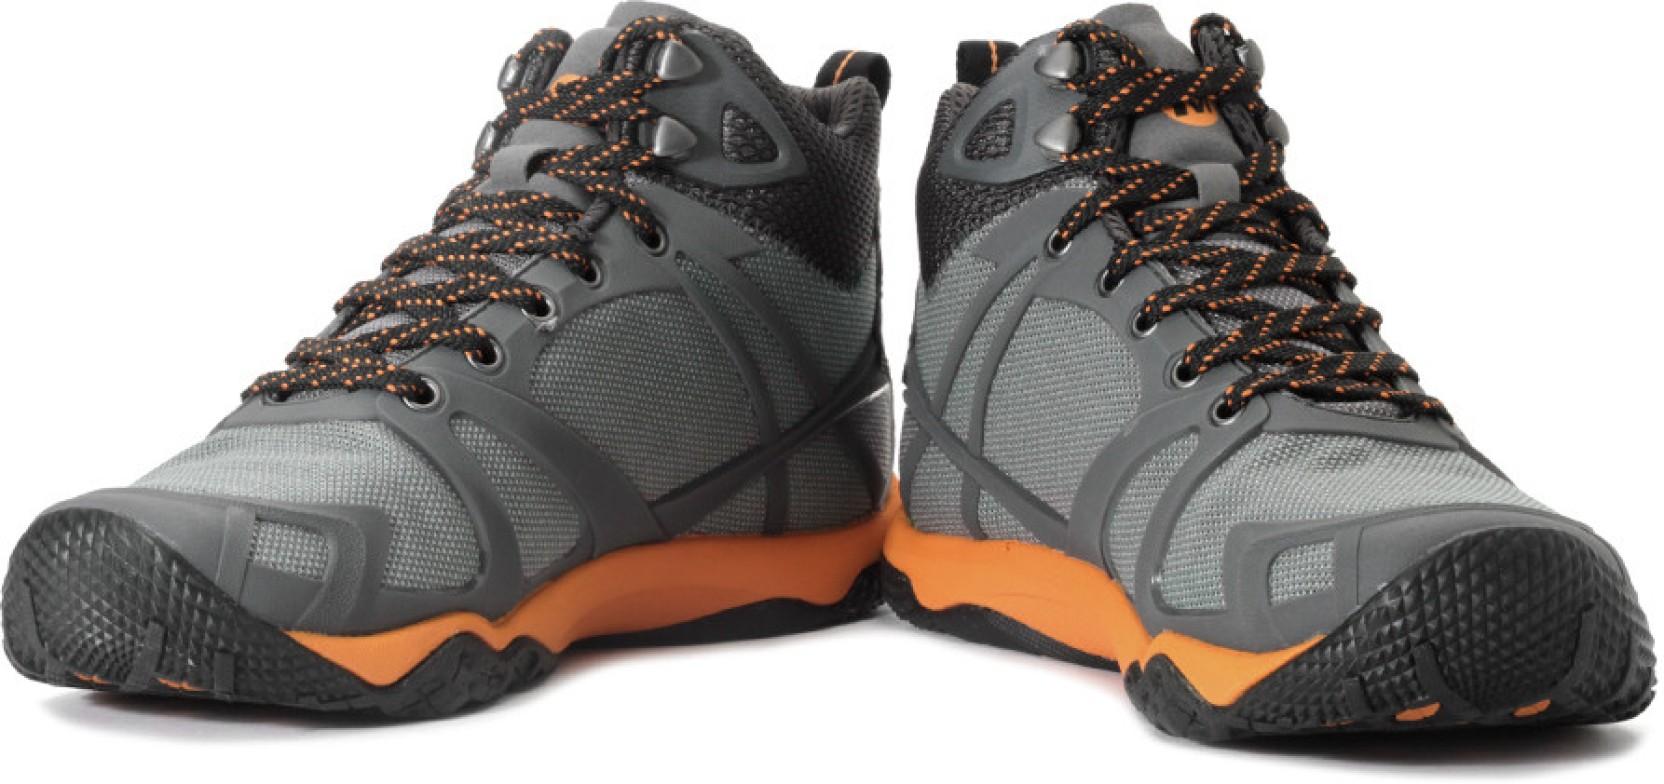 8d6c444cd2b9 Merrell Proterra Mid Sport Gore-Tex Hiking   Trekking Shoes For Men  (Orange